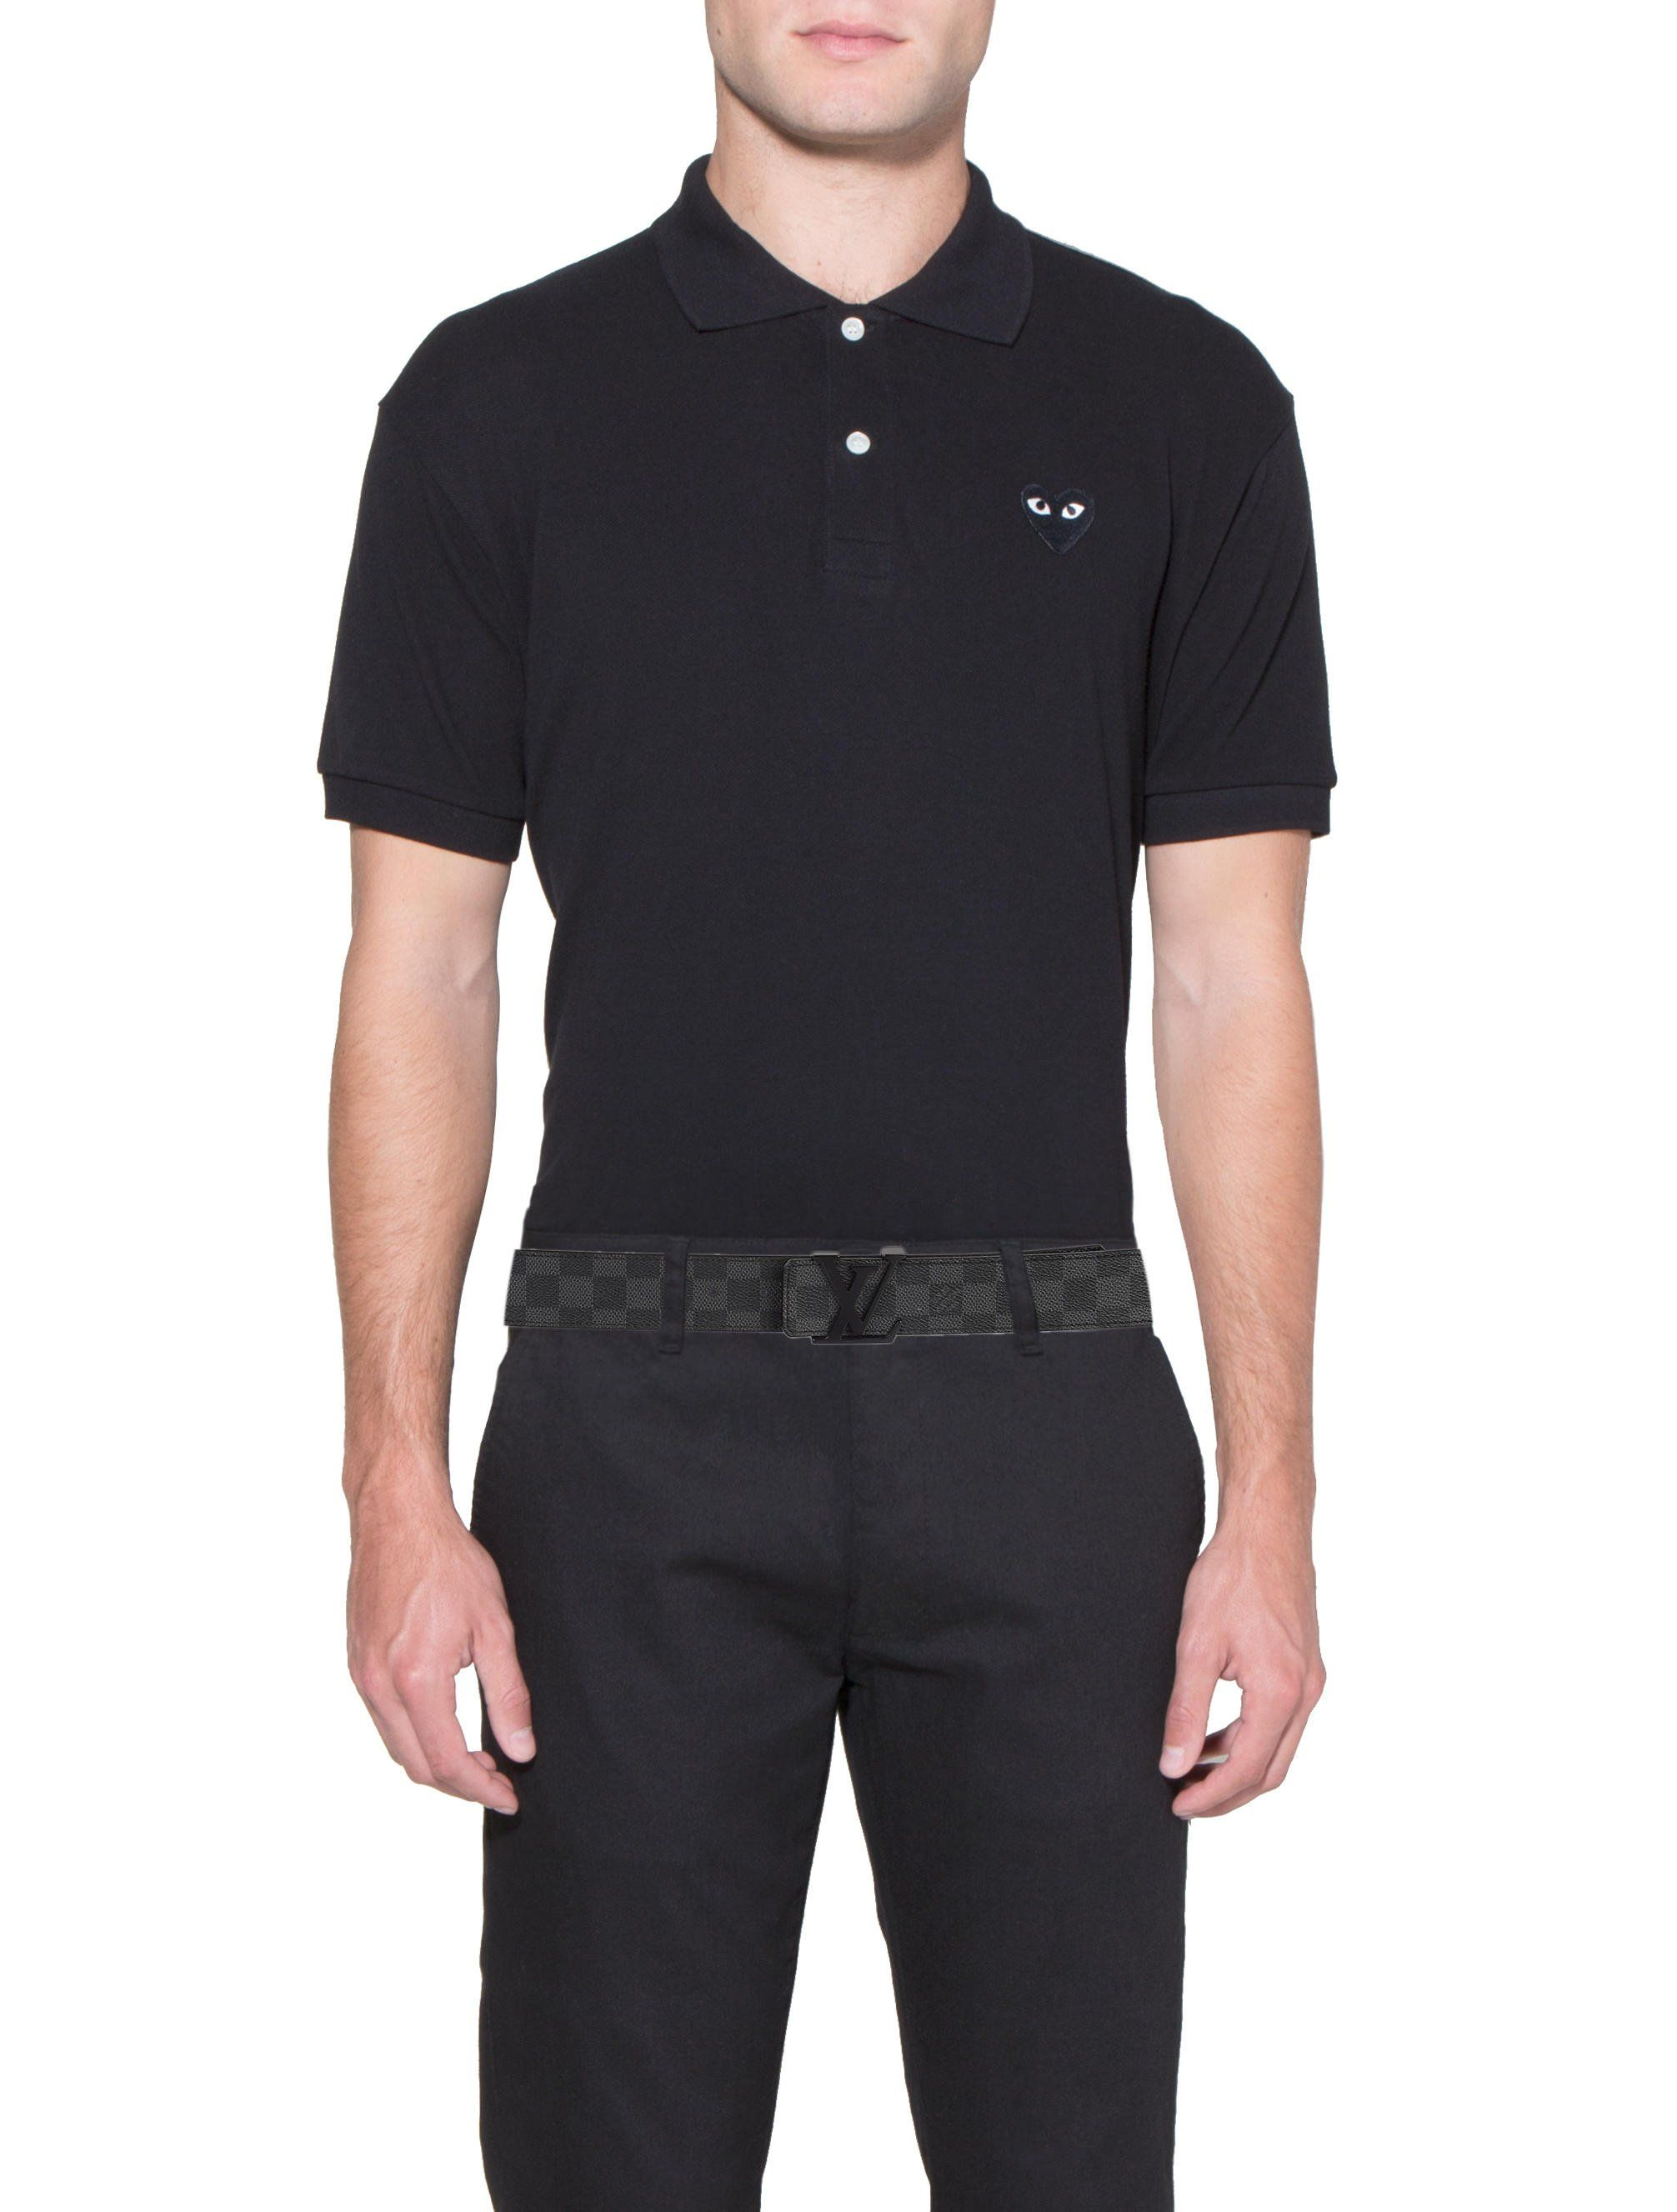 3ac98e8144da Men s black and charcoal Damier Graphite Louis Vuitton Initiales Belt with  black peg-in-hole buckle closure. Date code reads AC2187. Designer size 90.  Inclu